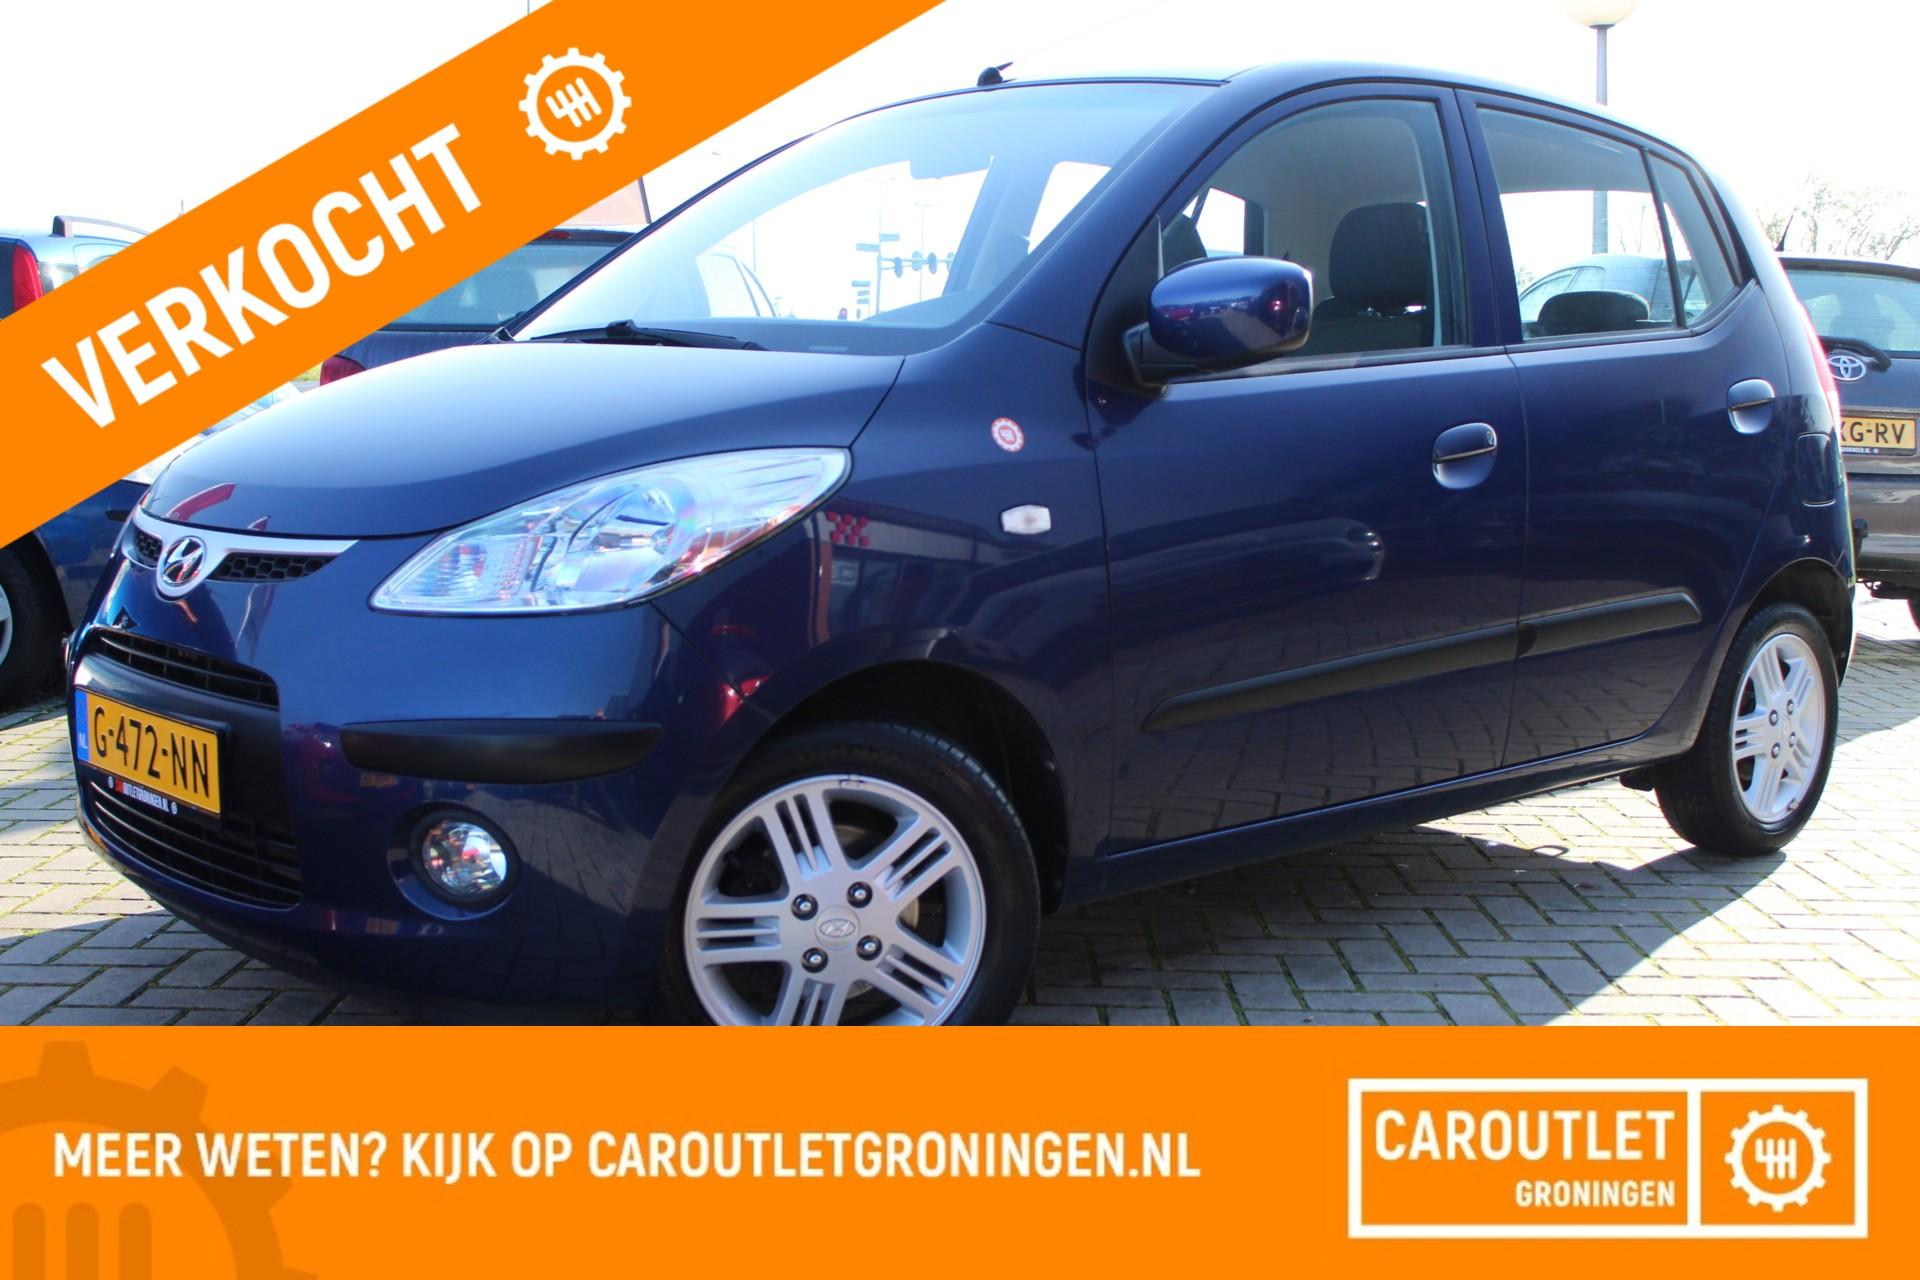 Caroutlet Groningen - Hyundai i10 1.1 Active Cool   AIRCO   NW APK   HOOGZITTER